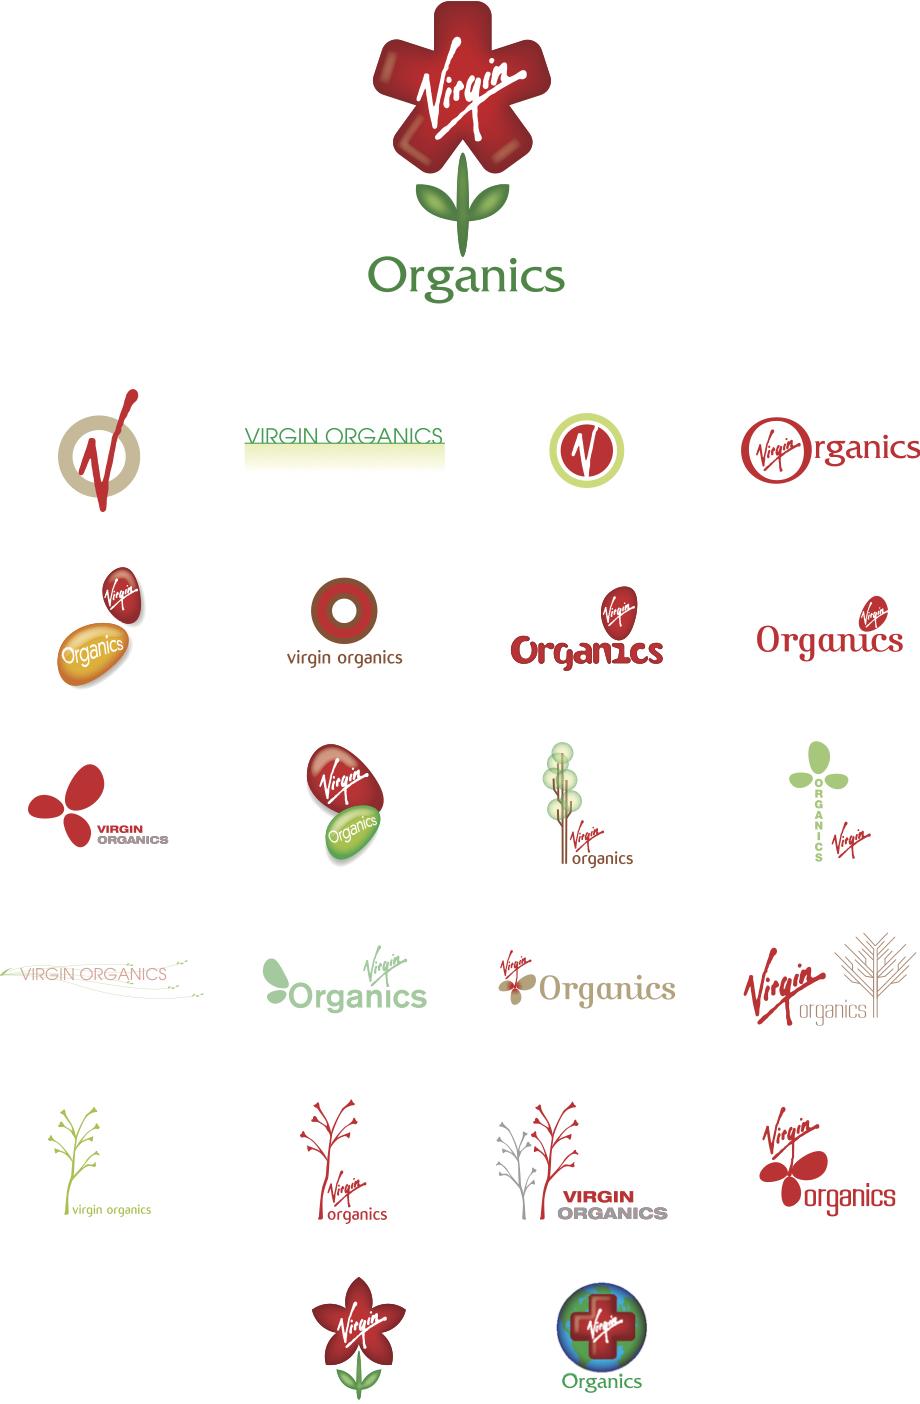 virgin-organics.jpg